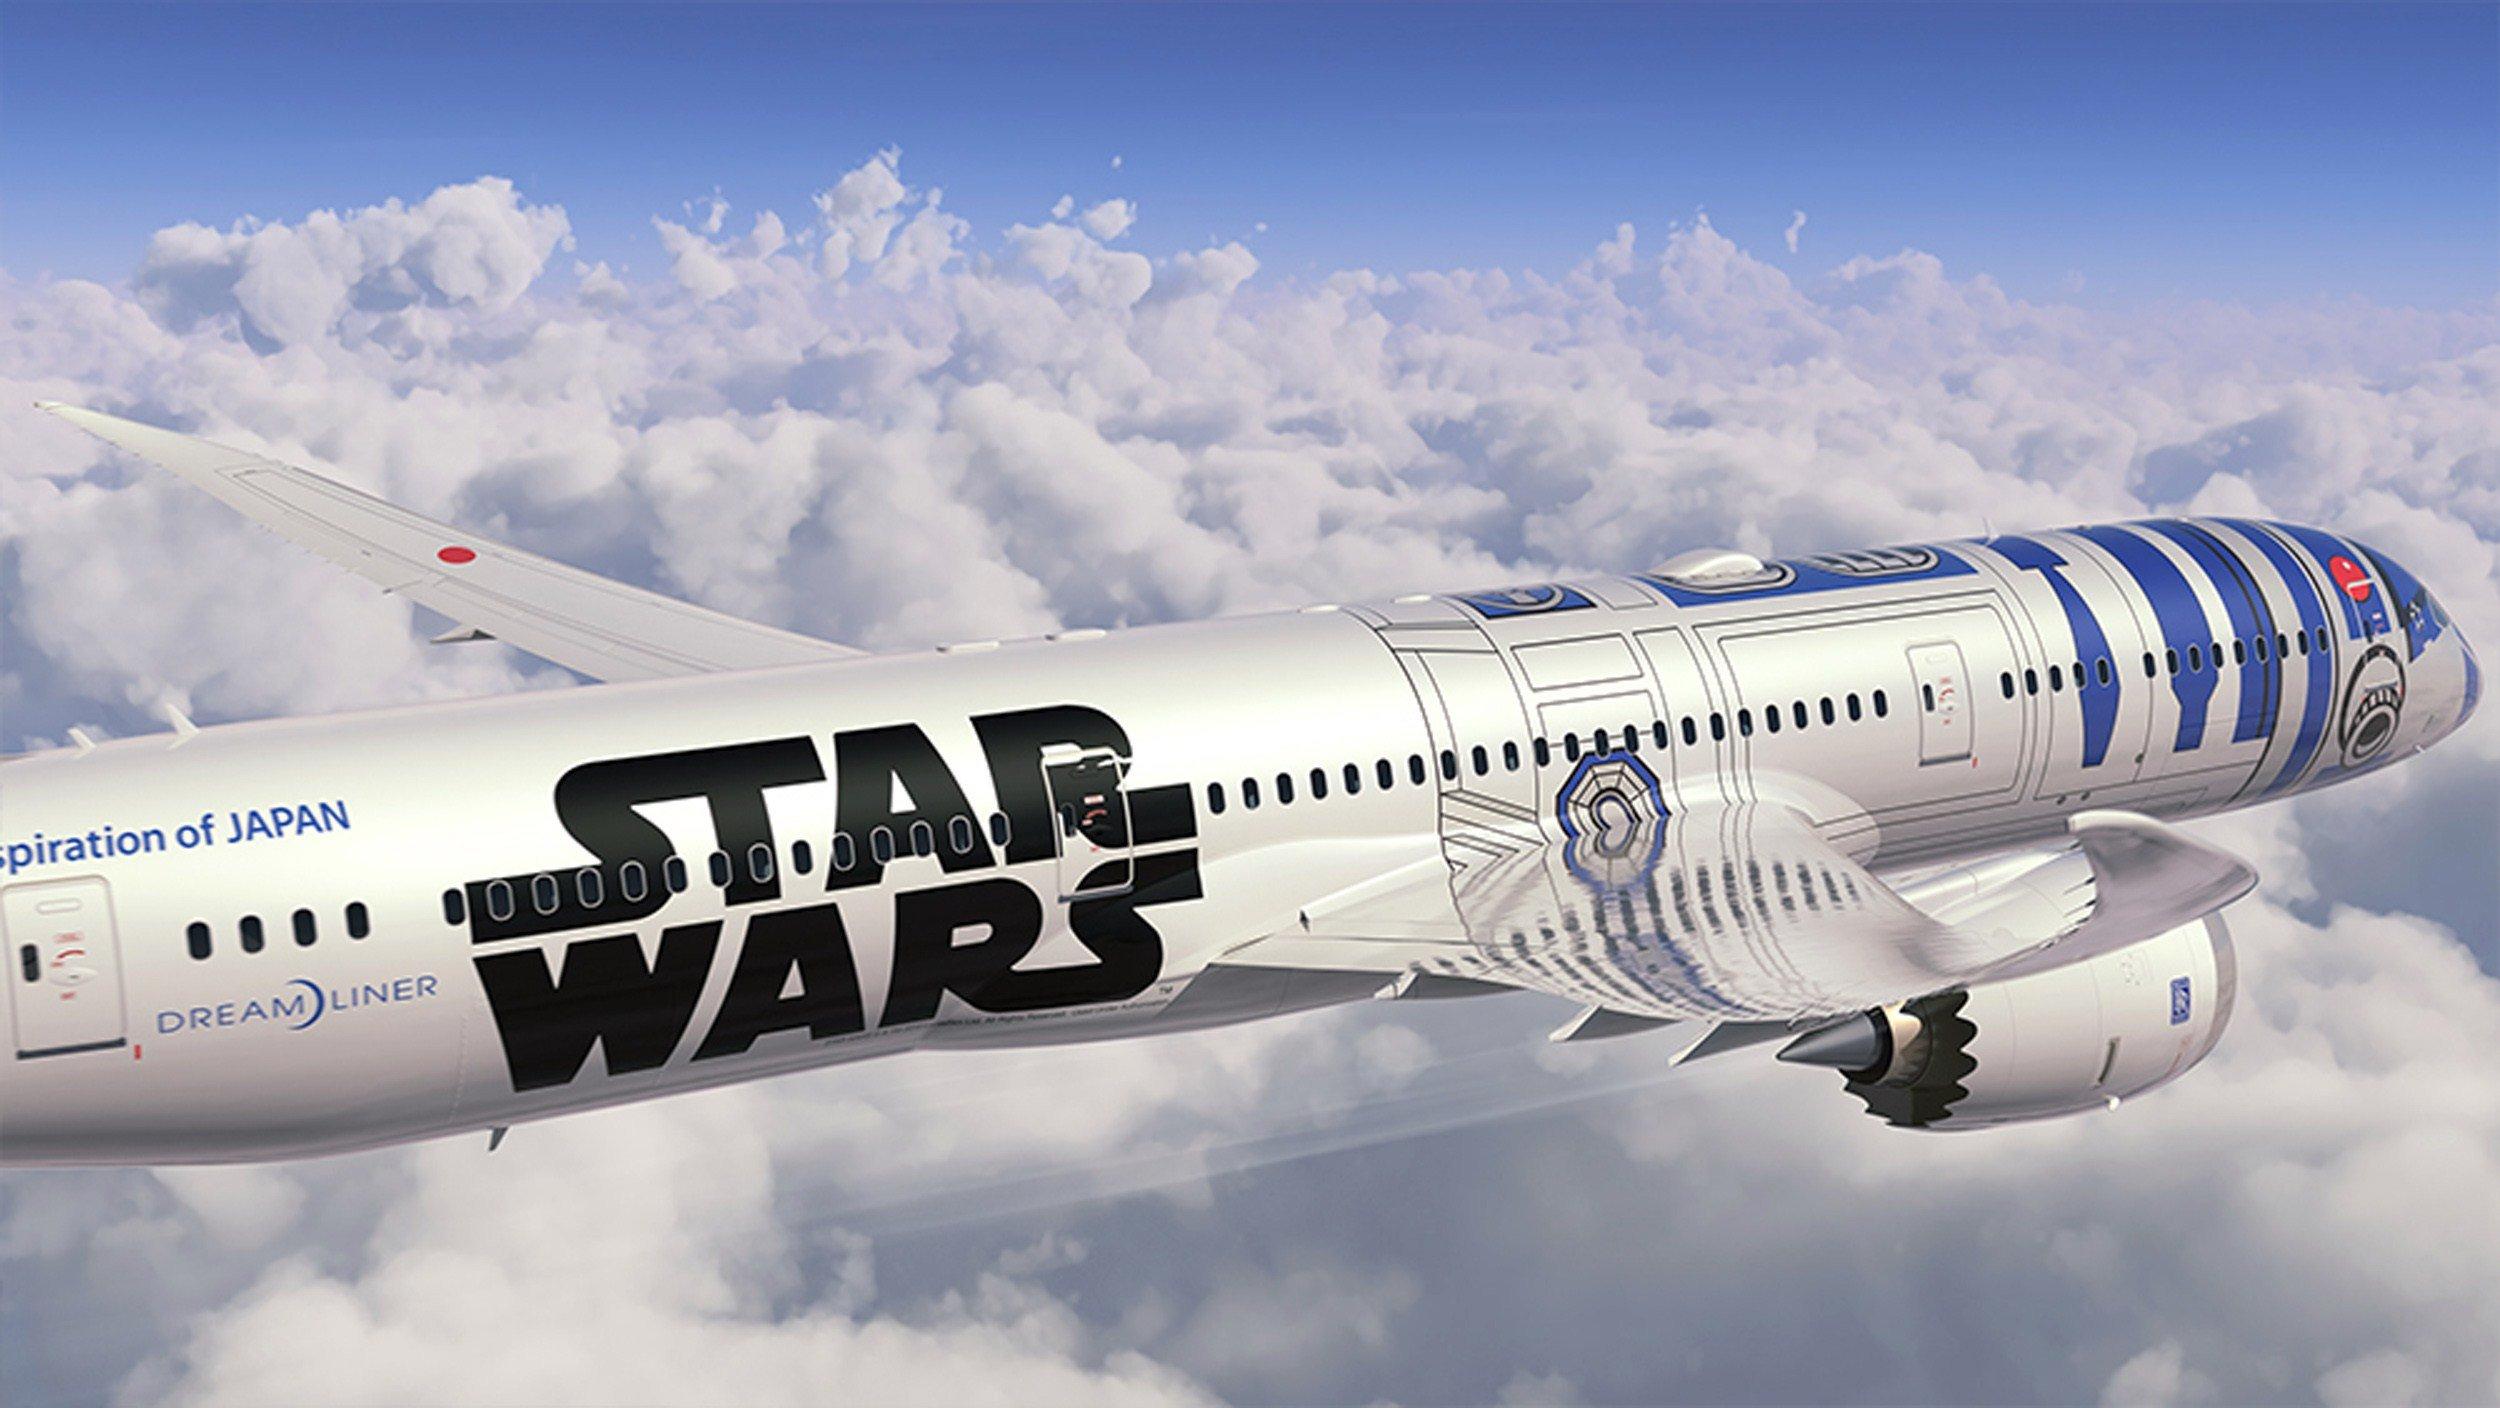 Millennium Falcon It Ain't: ANA Goes 'Star Wars'